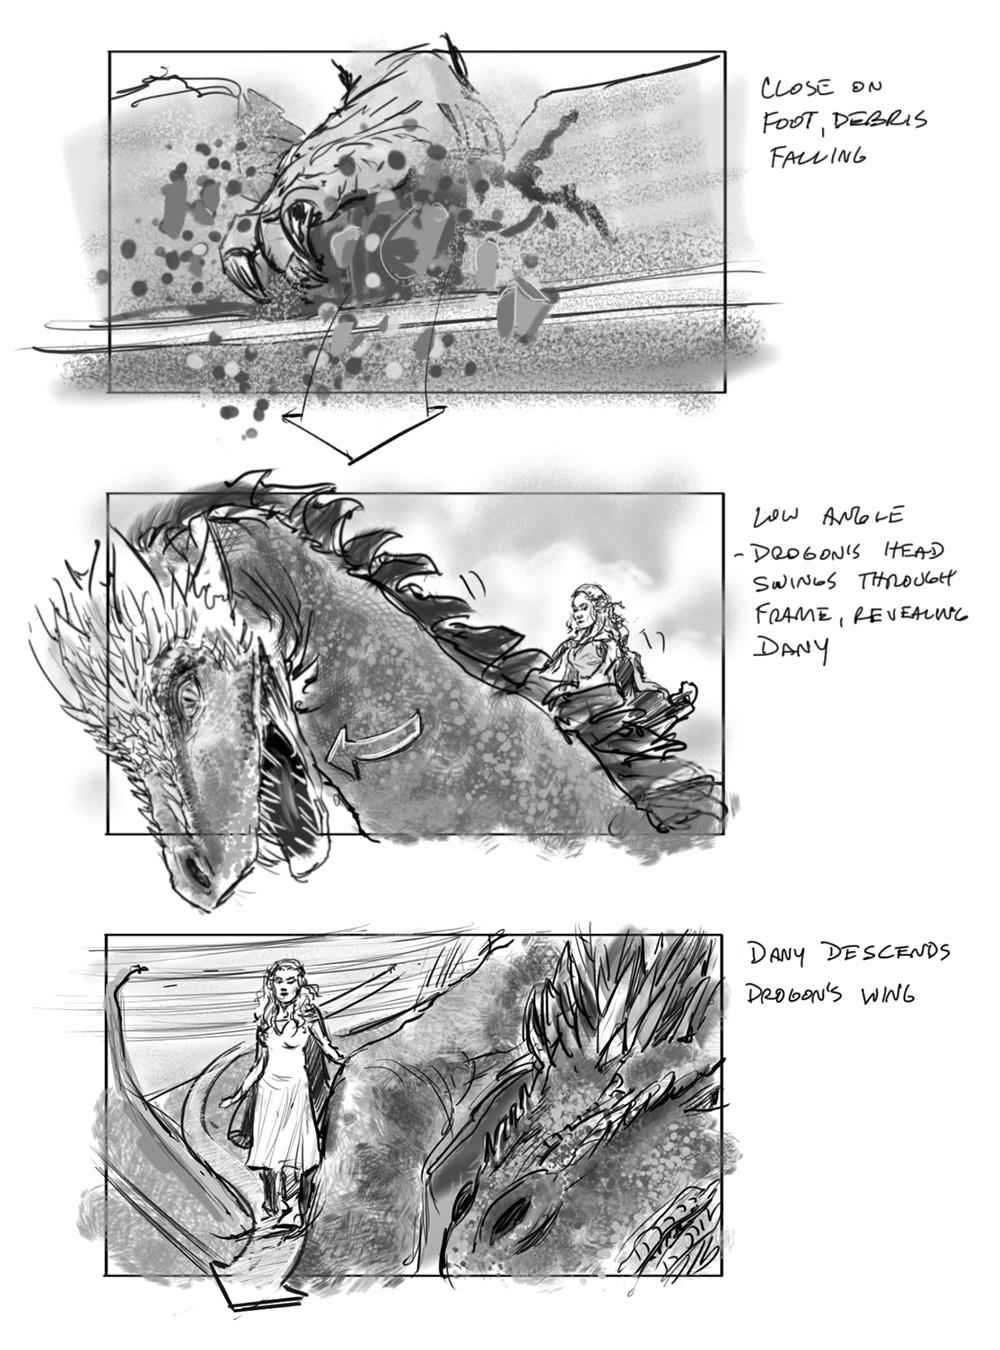 mgot_s7_ep07_storyboards_dragonpit_02.jpg